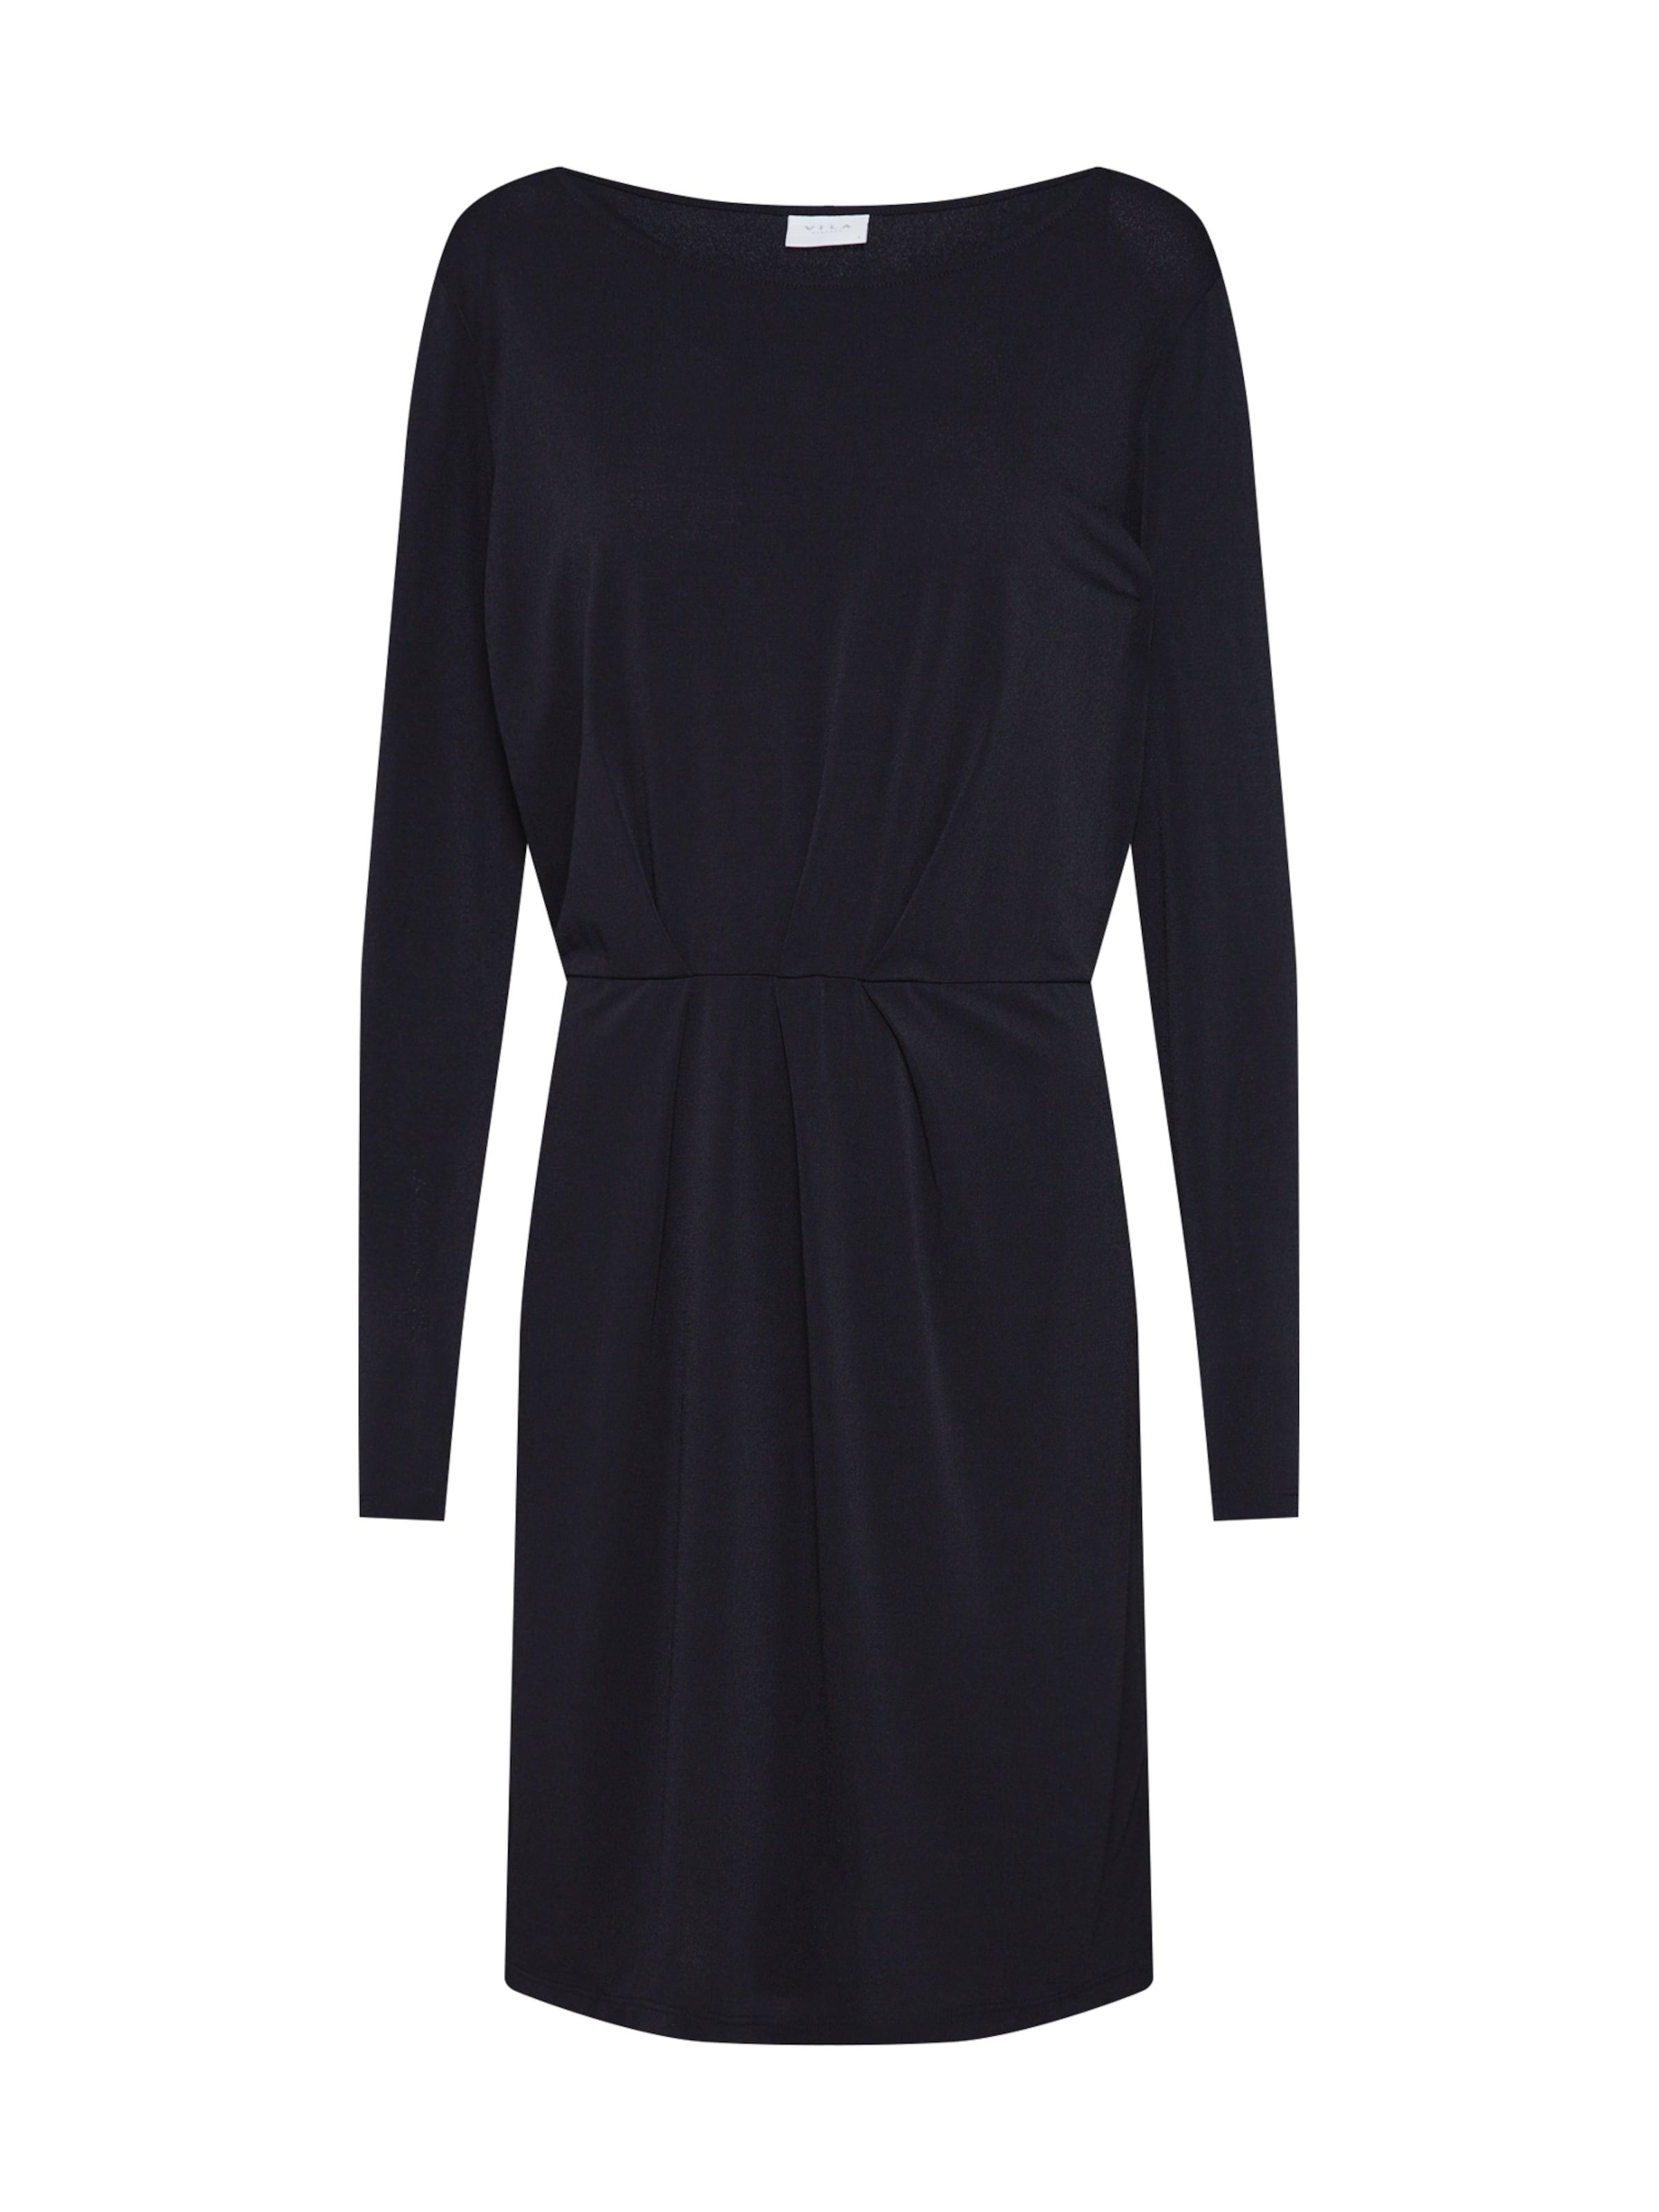 Vila 'classy' En Robe Robe Vila Noir rWBexQdCo